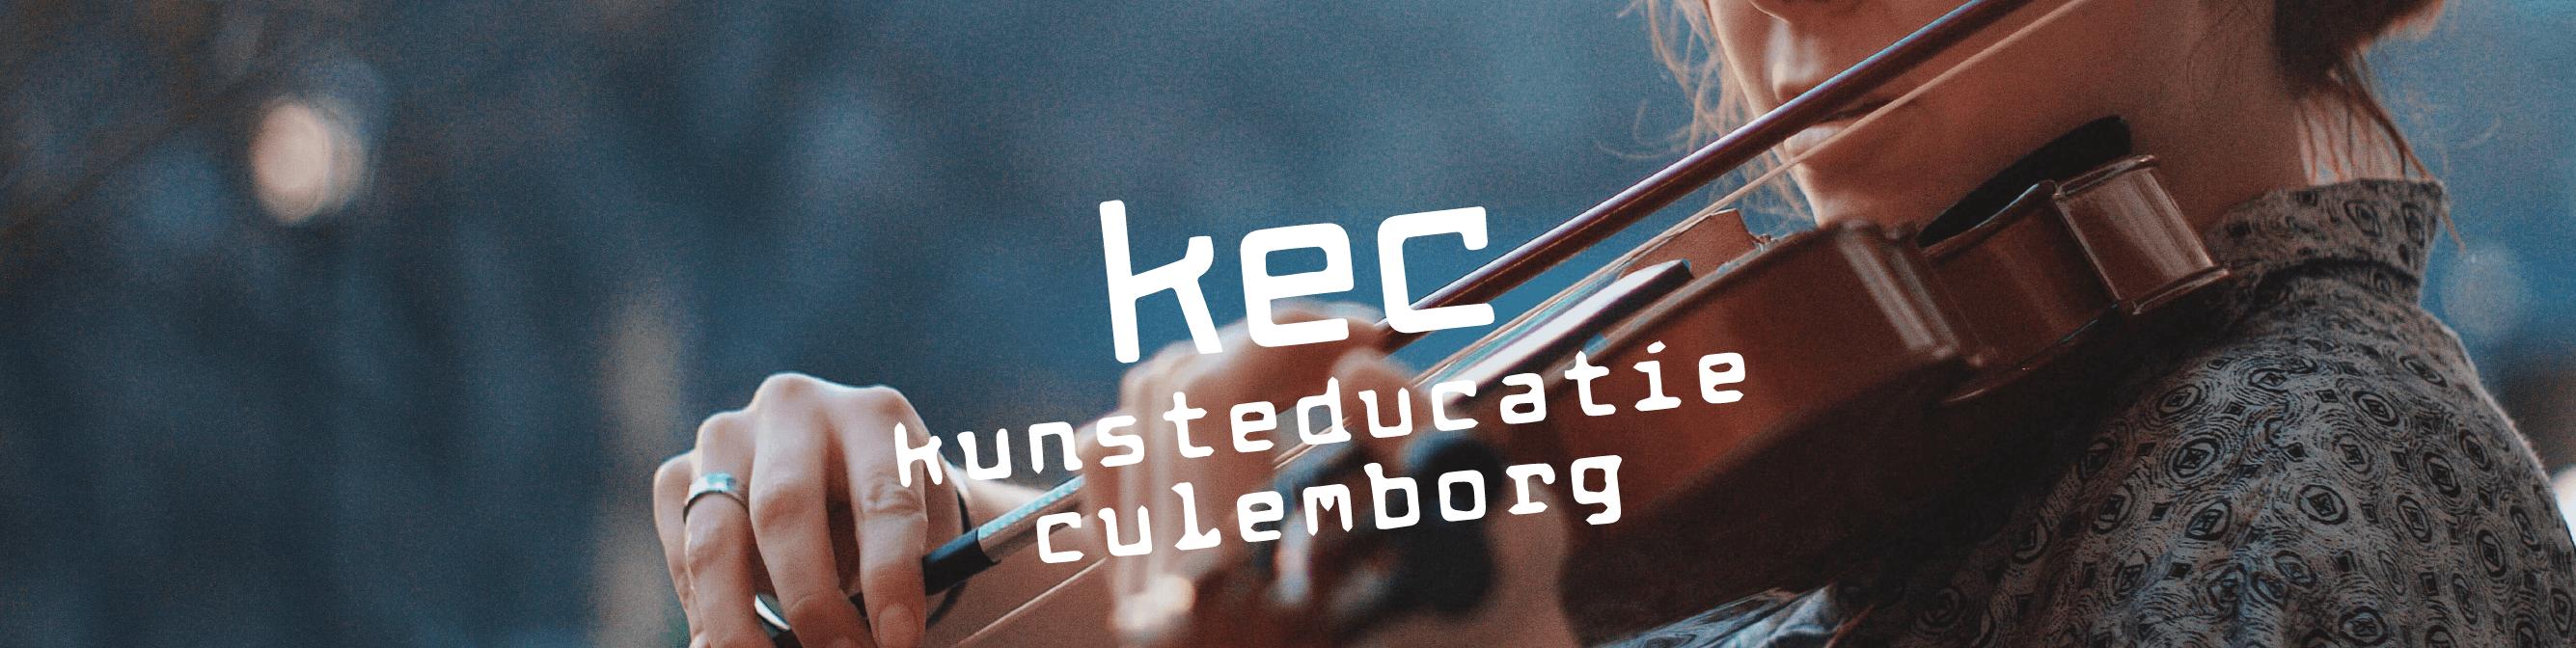 Kunsteducatie Culemborg